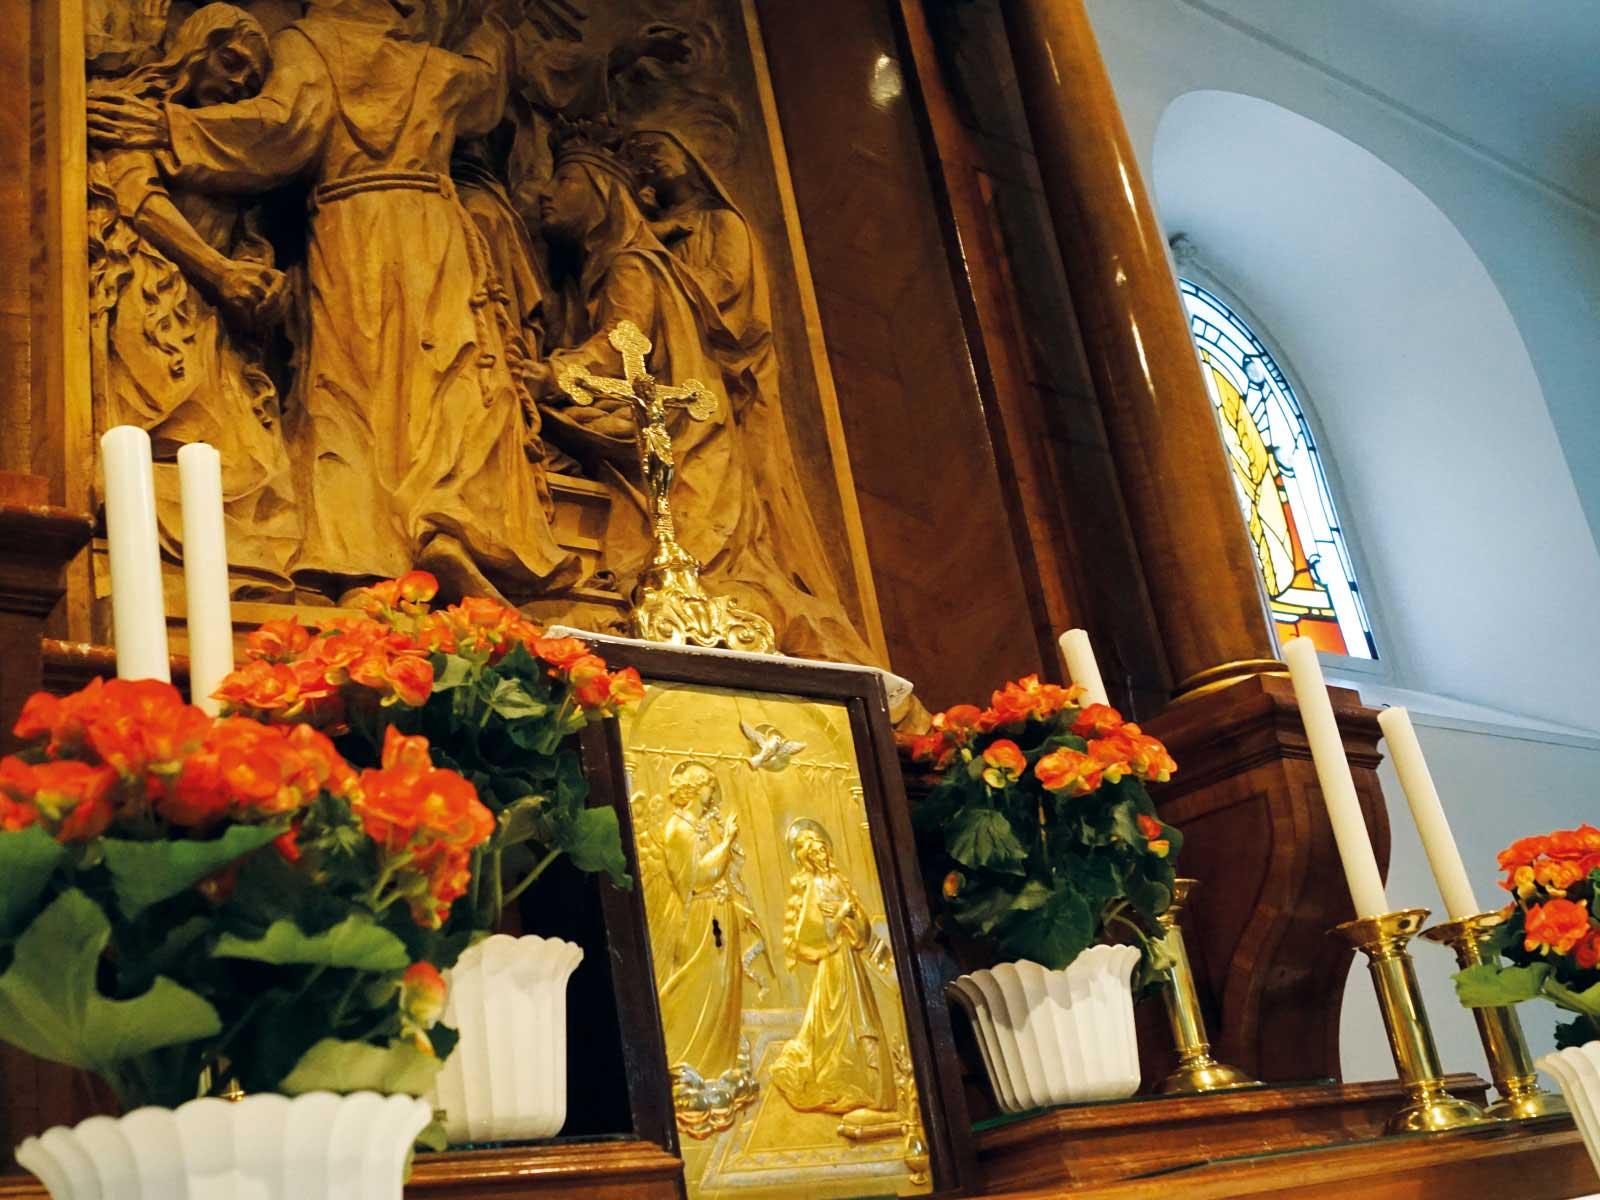 Seniorenzentrum-Bruder-Konrad-Stift-Hauskapelle-St-Anselmus-Altar